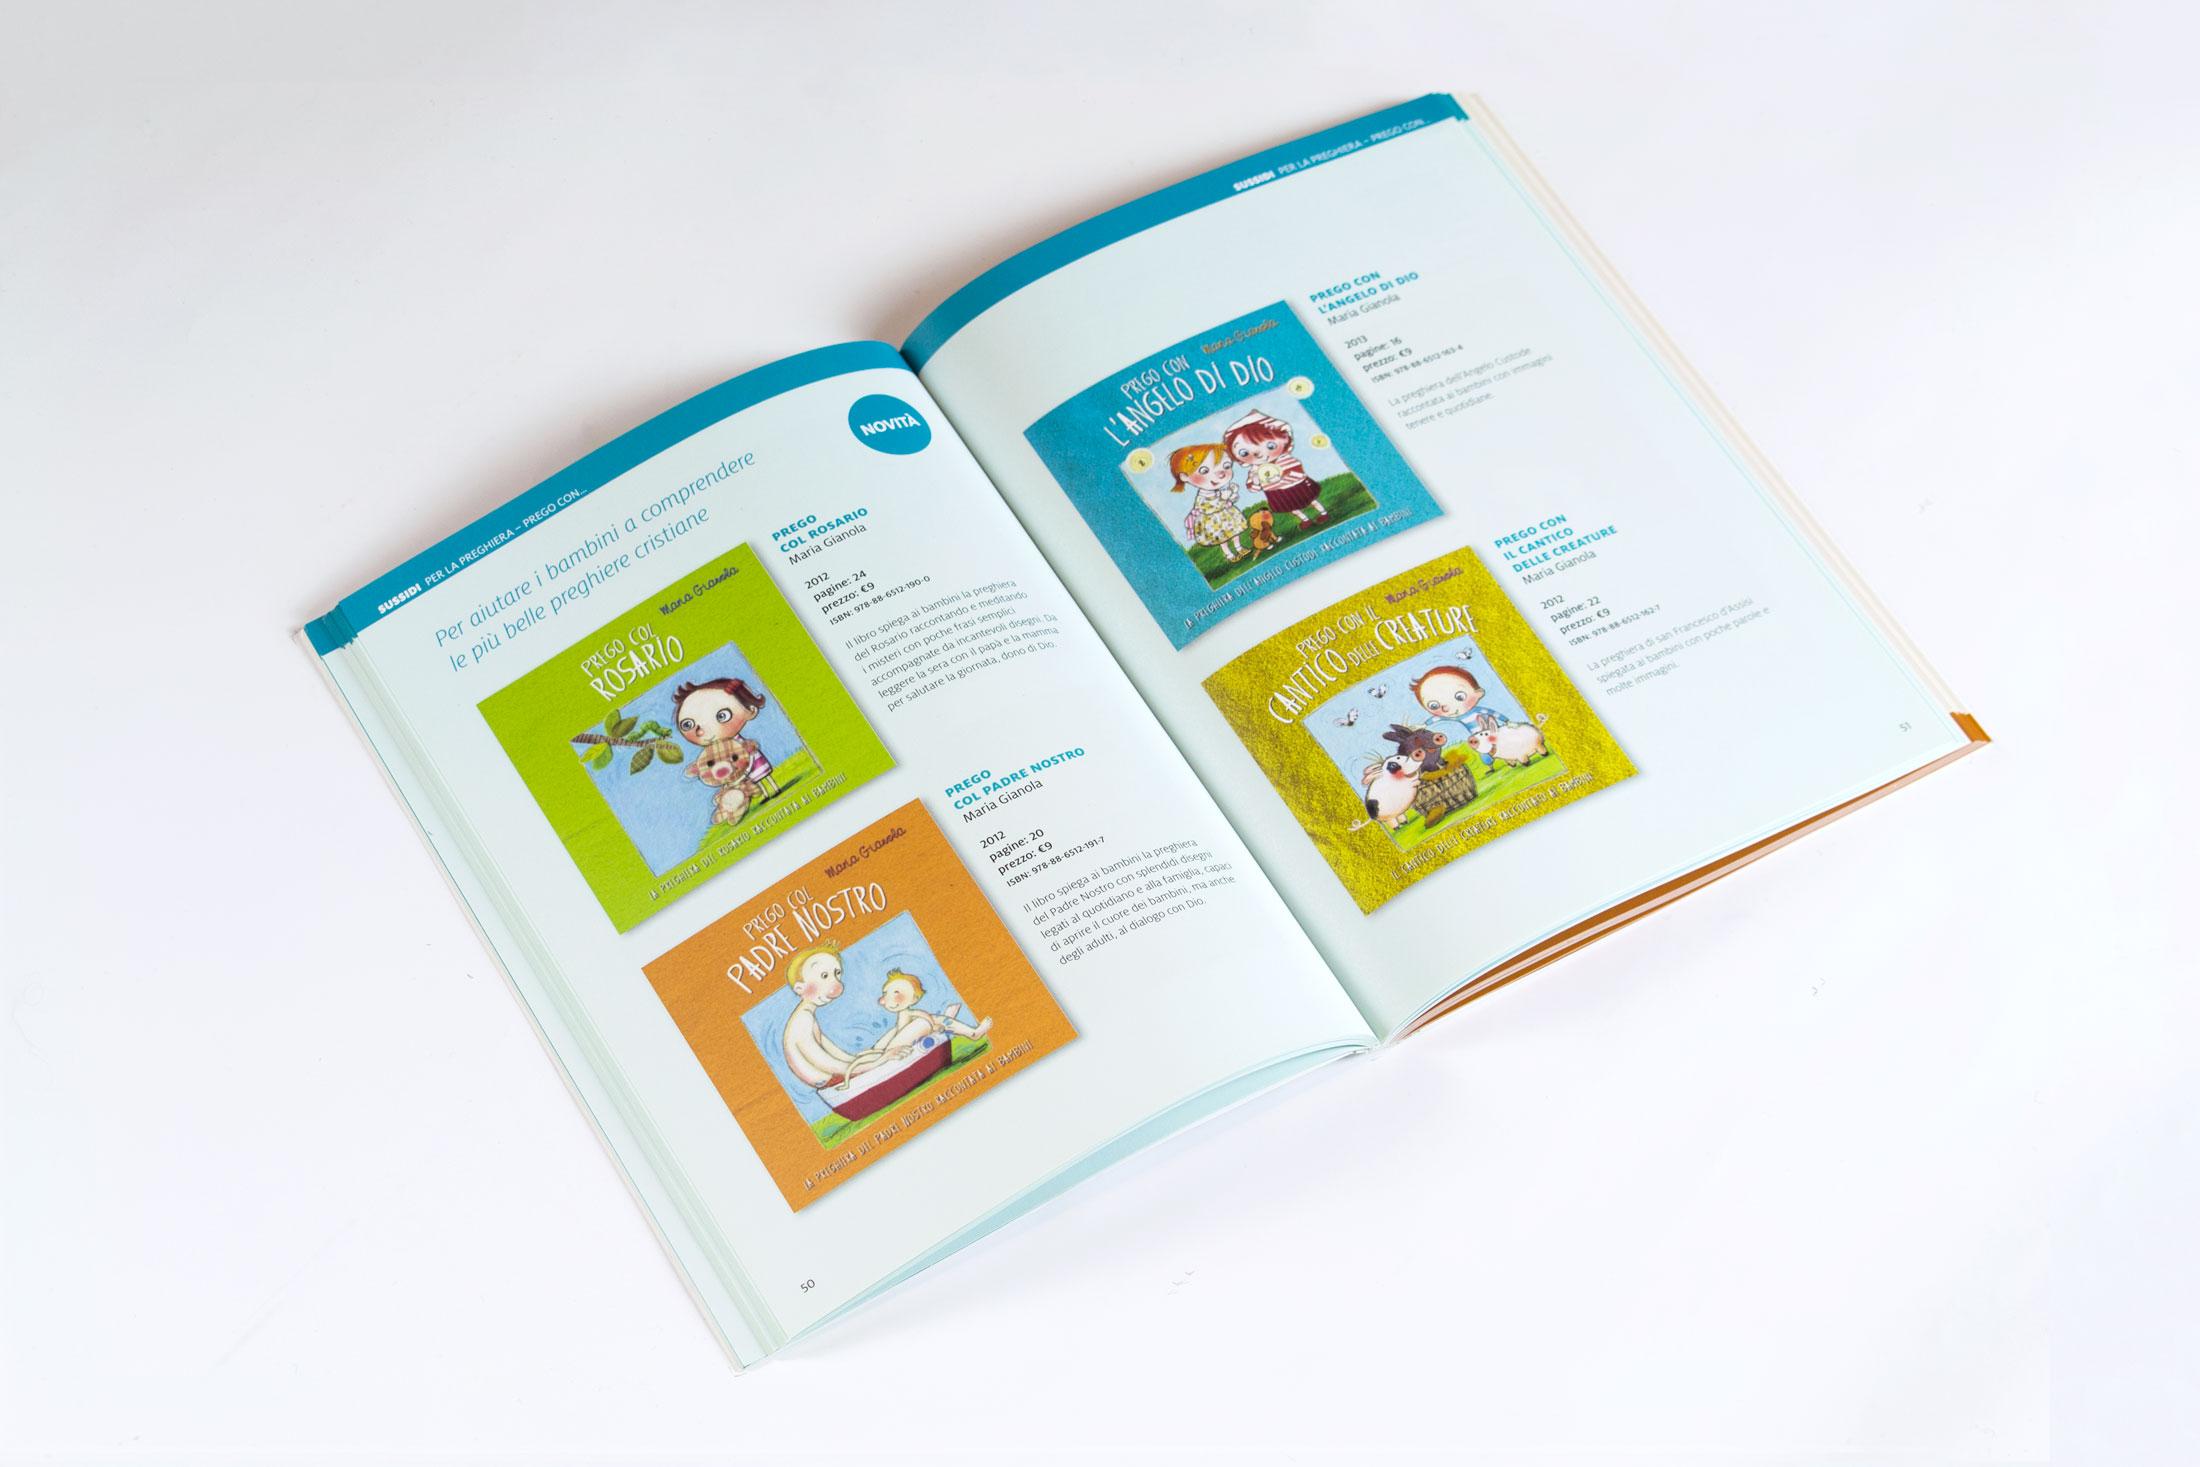 Catalogo Marcianum Press - interno 5